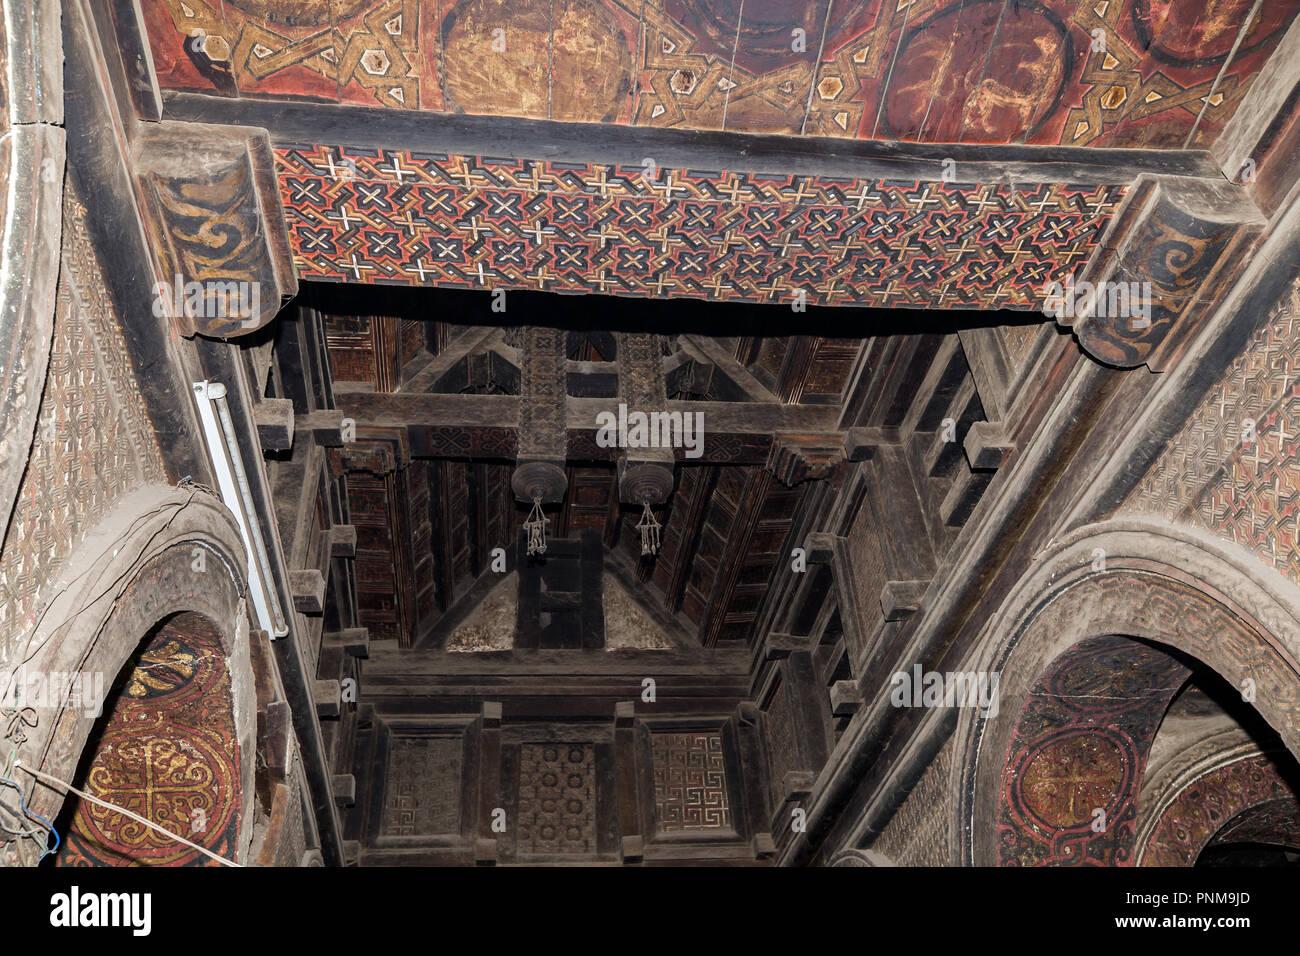 Interior: Yemrehanna Kristos Monastery, Lalibela, Ethiopia - Stock Image